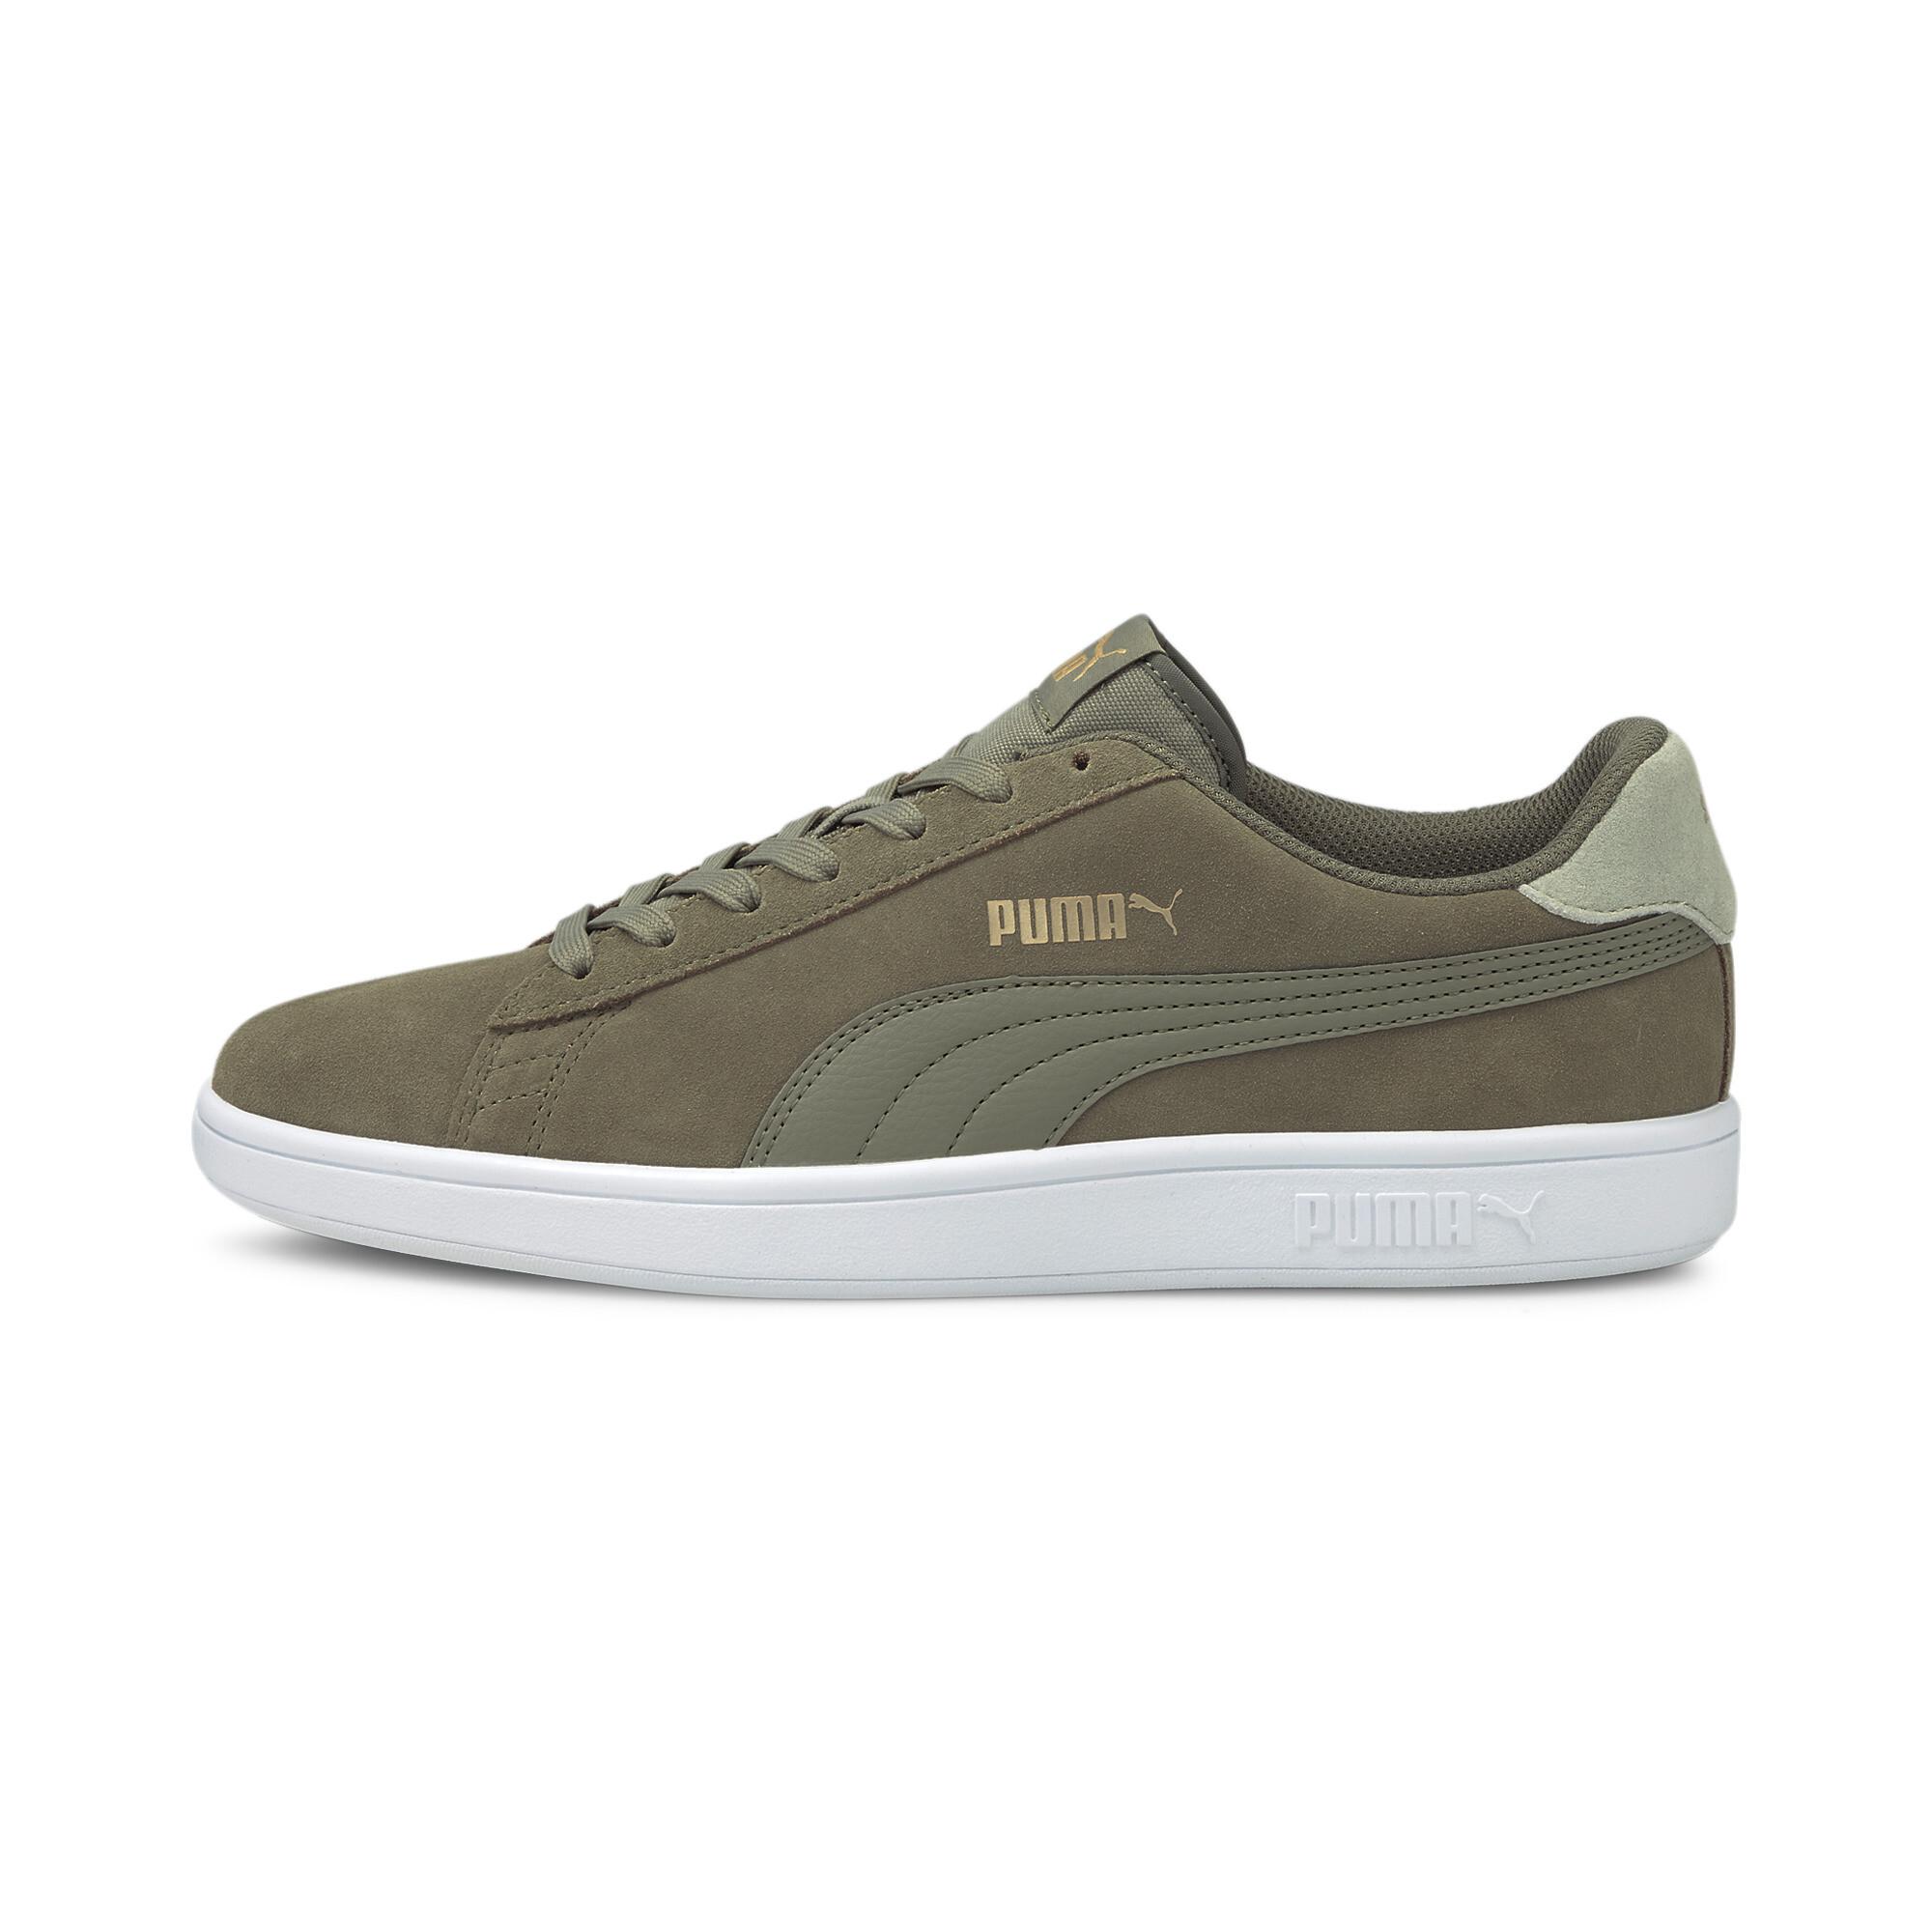 miniature 14 - Puma Men's Smash v2 Sneakers